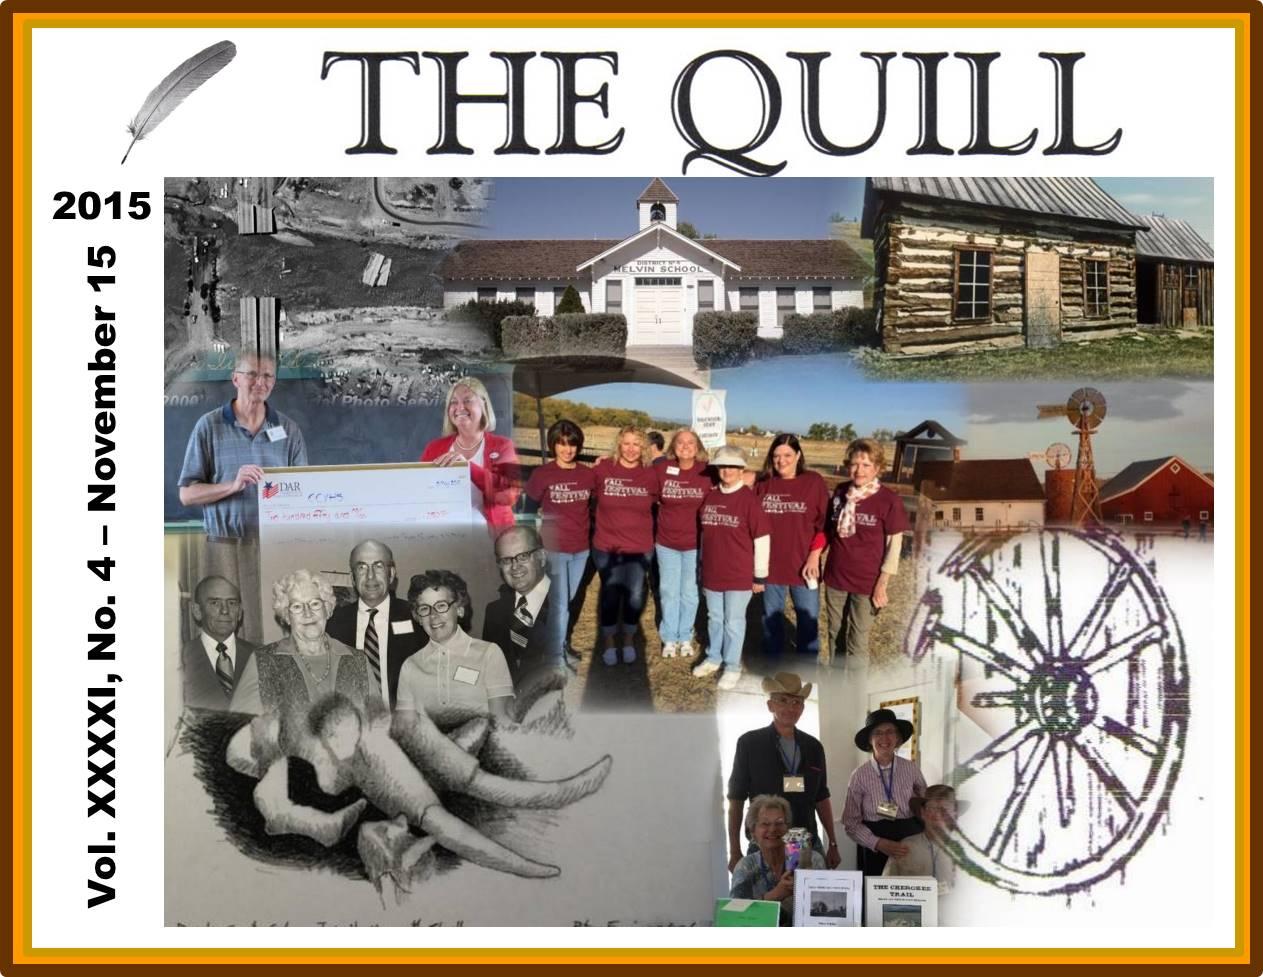 CCVHS Nov 2015 - The Quill